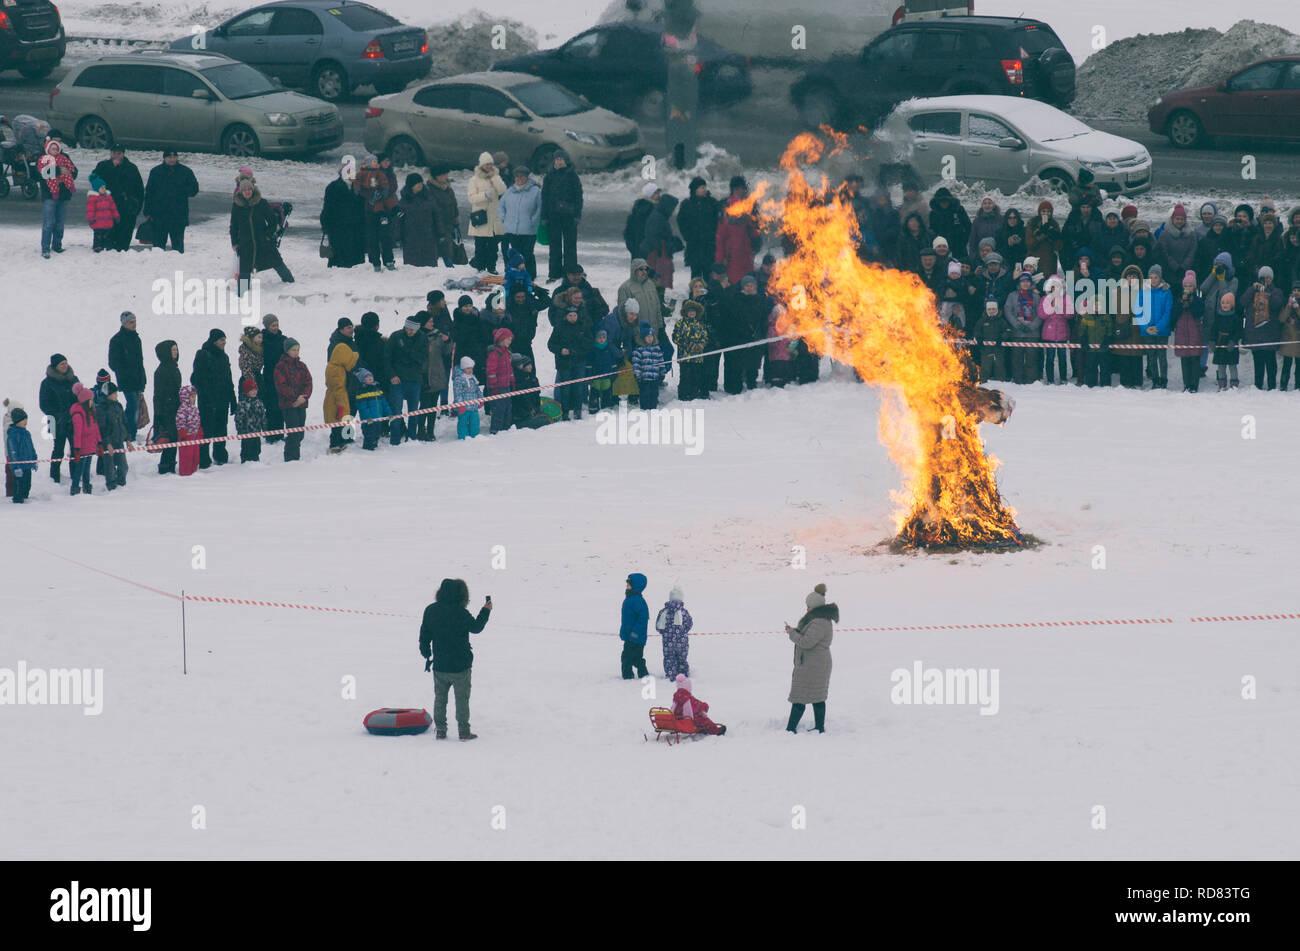 Saint Petersburg , Russia - February 17, 2018: Russian holiday Maslenitsa. The burning of the straw figure symbolizing winter. - Stock Image